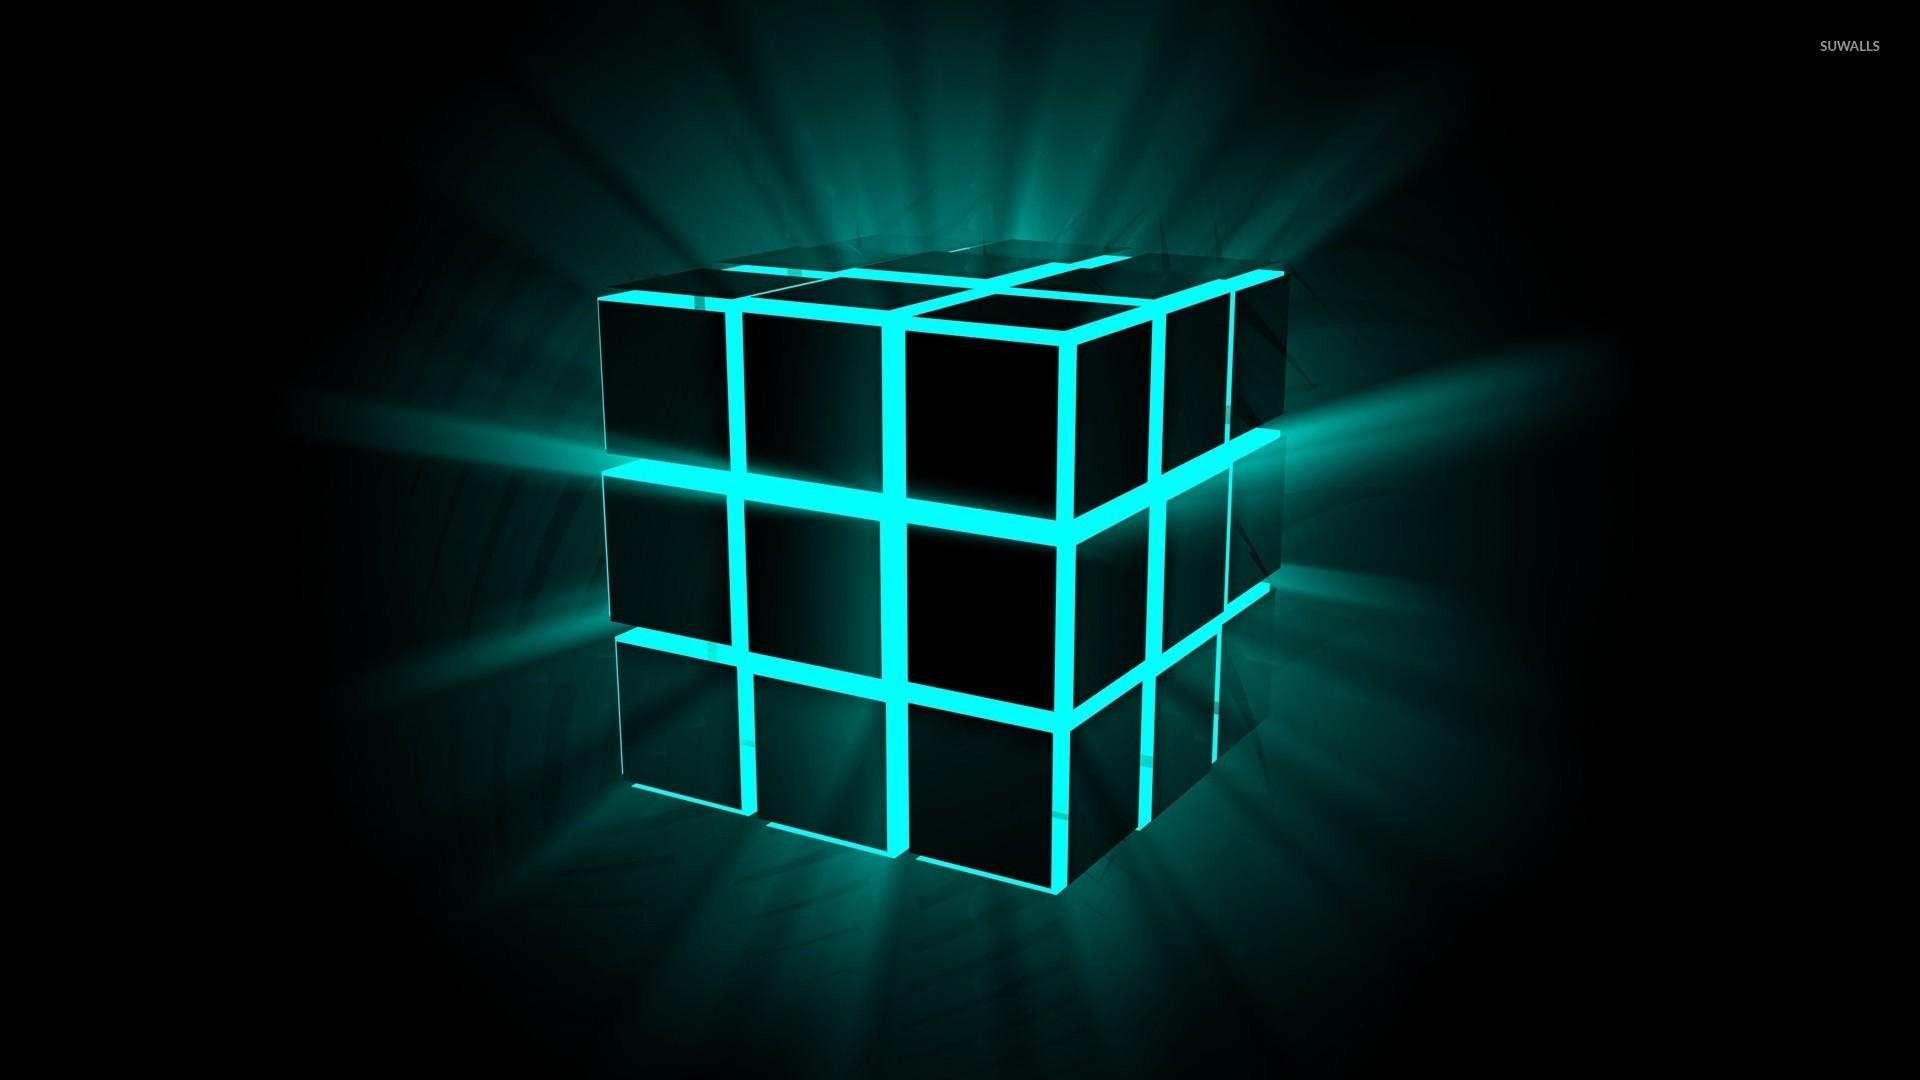 Neon cube wallpaper   3D wallpapers   23099 1920x1080